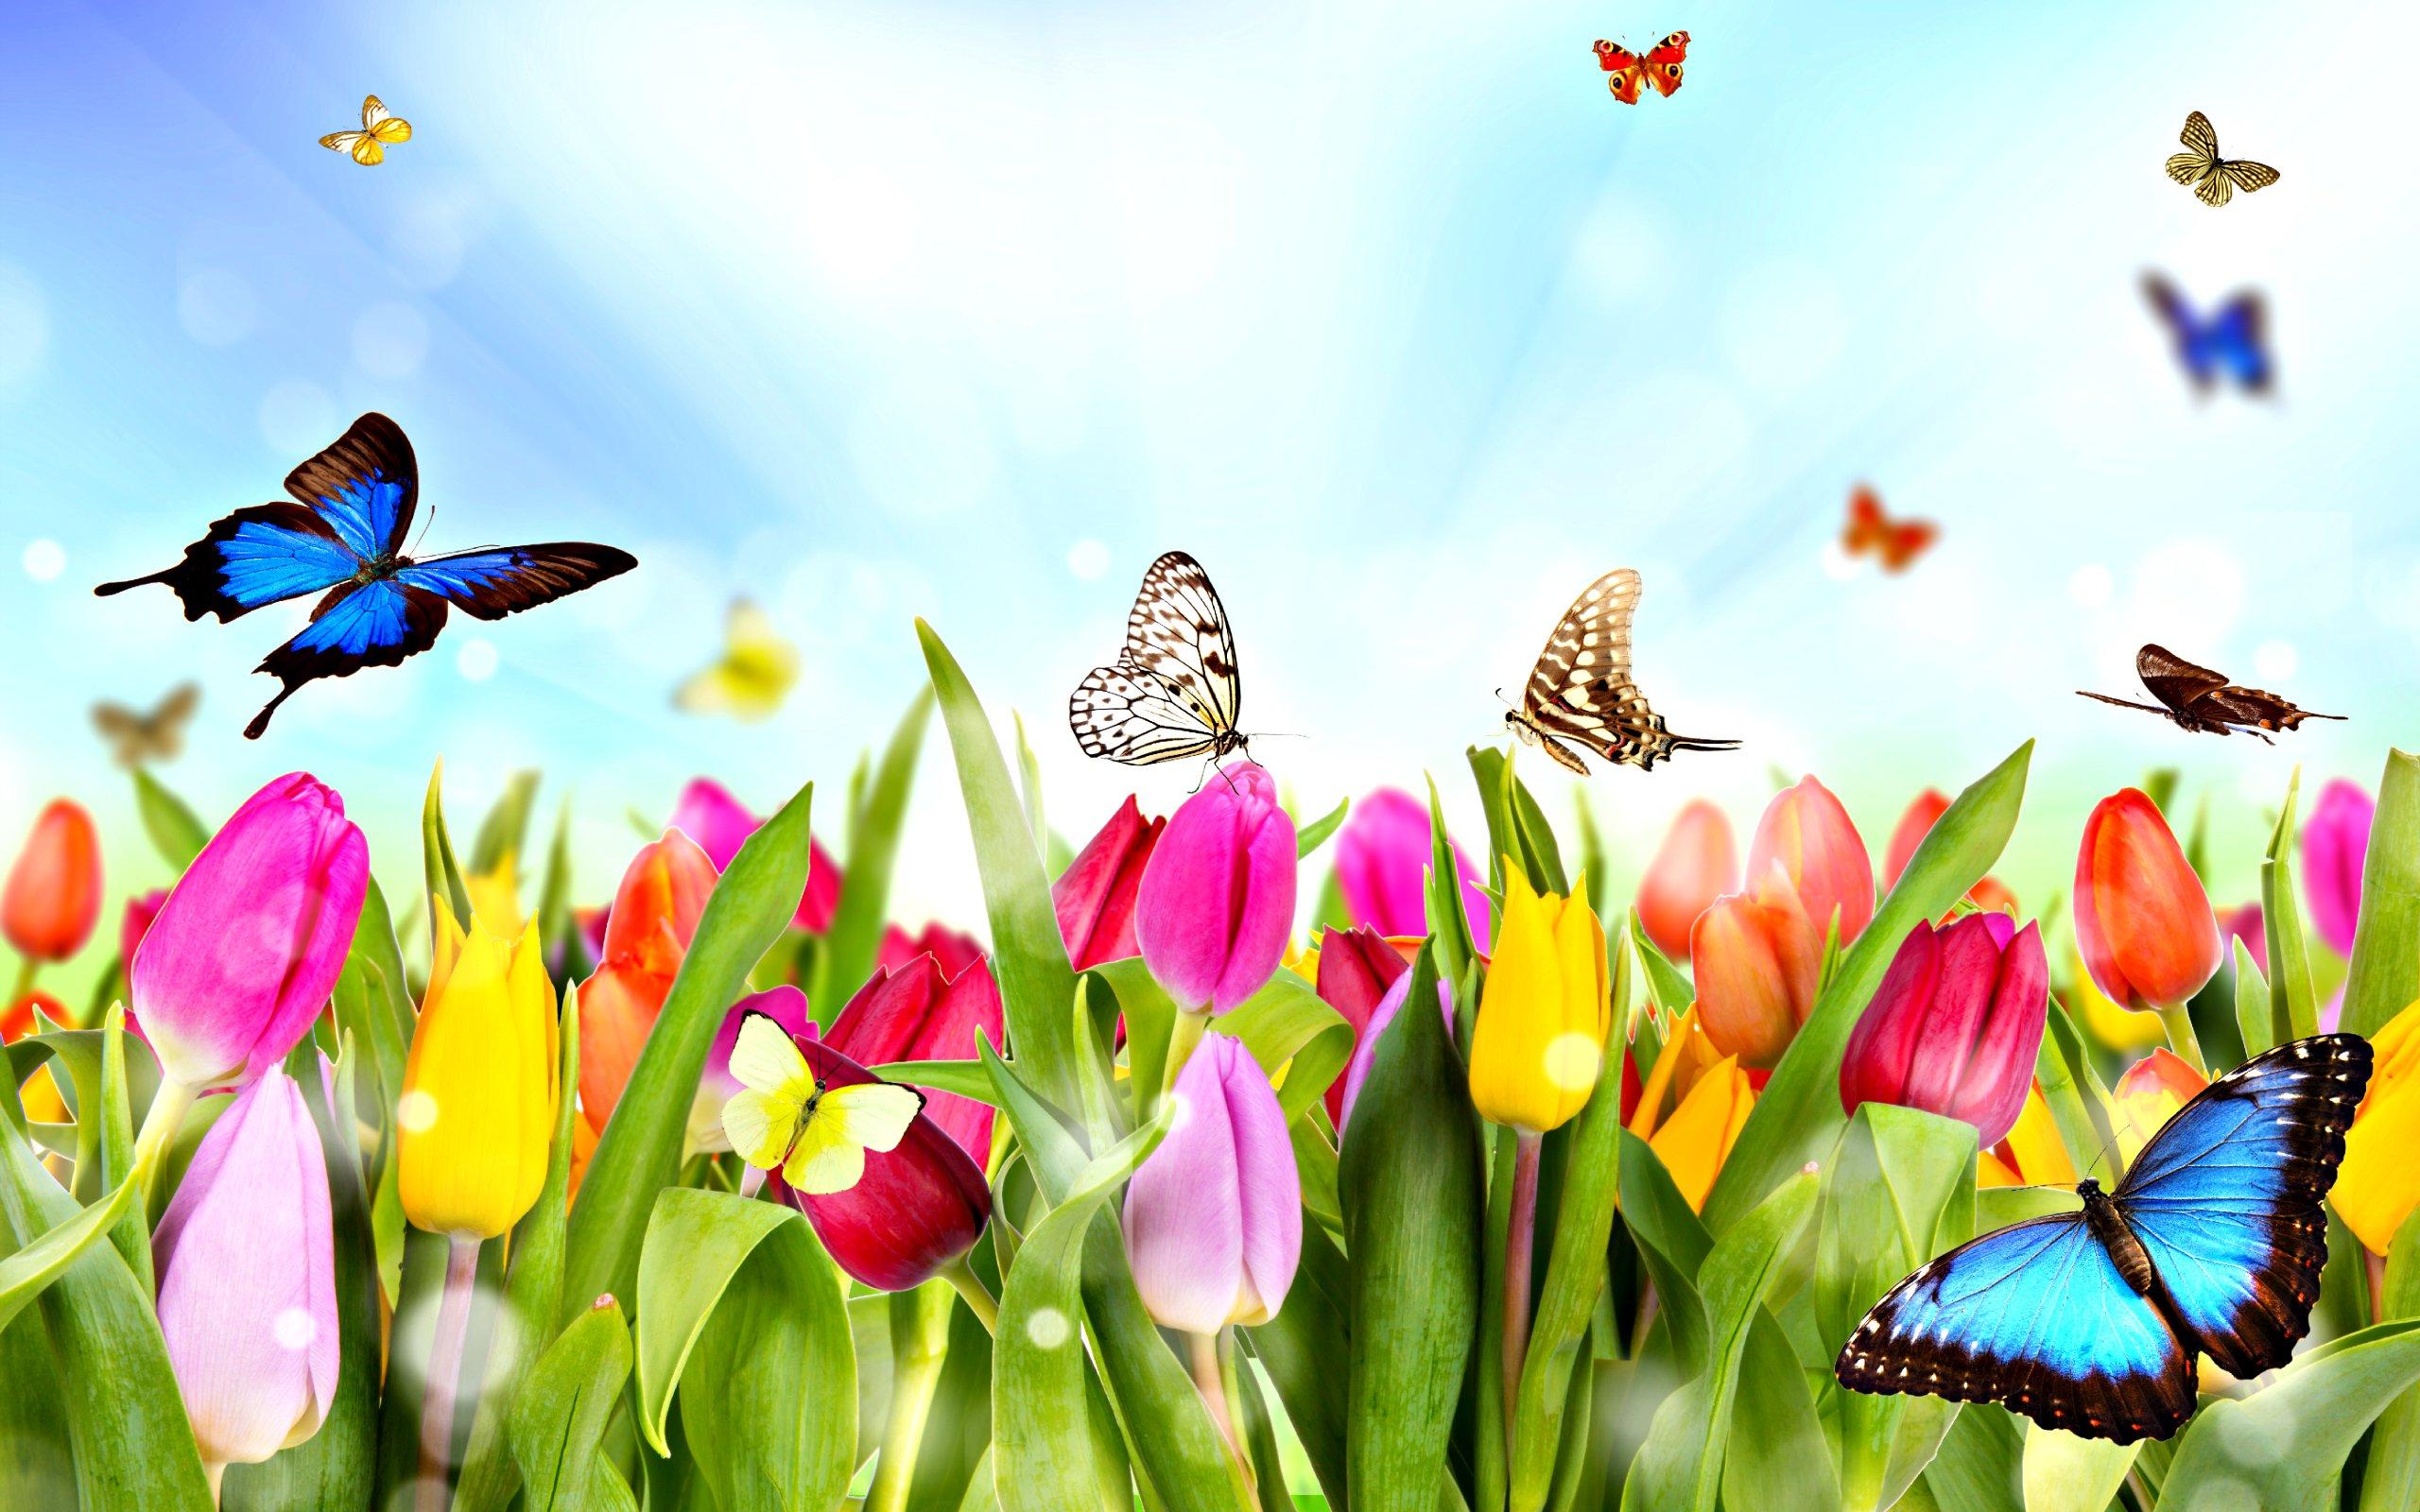 dream-spring-2012-spring-time_2560x1600_96689